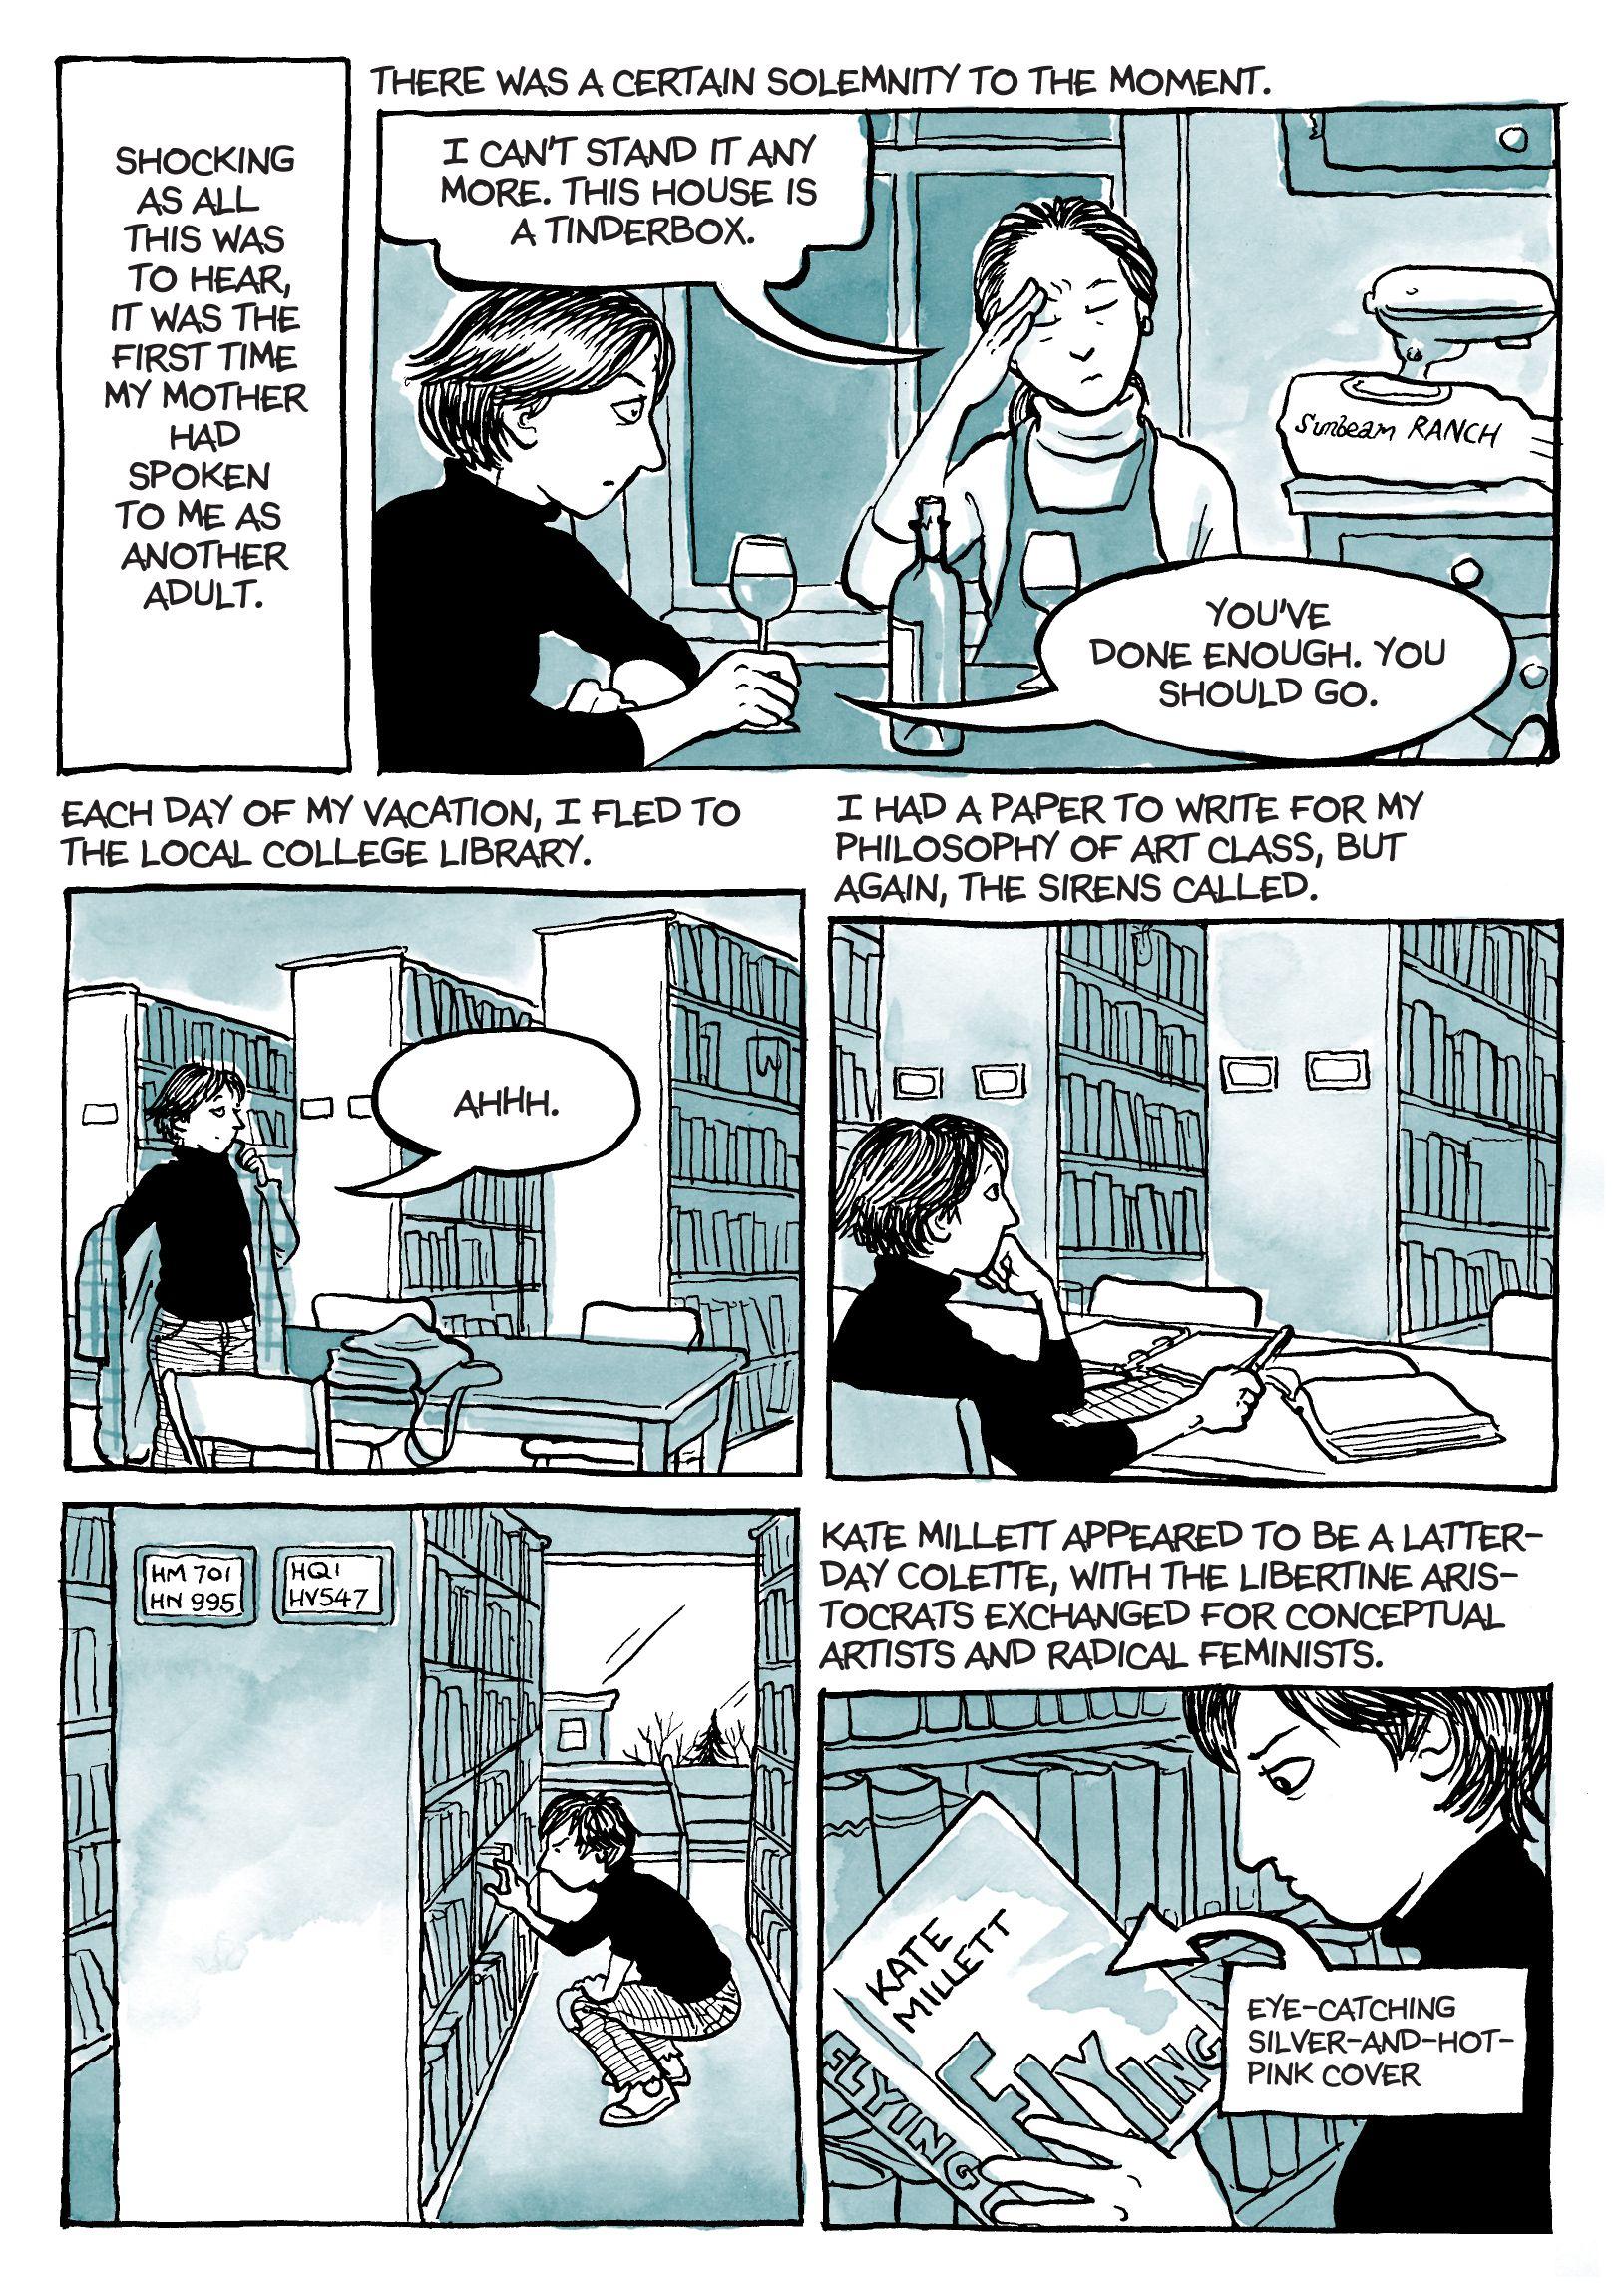 Alison Bechdel | Fun Home/Alison Bechdel | Comic styles